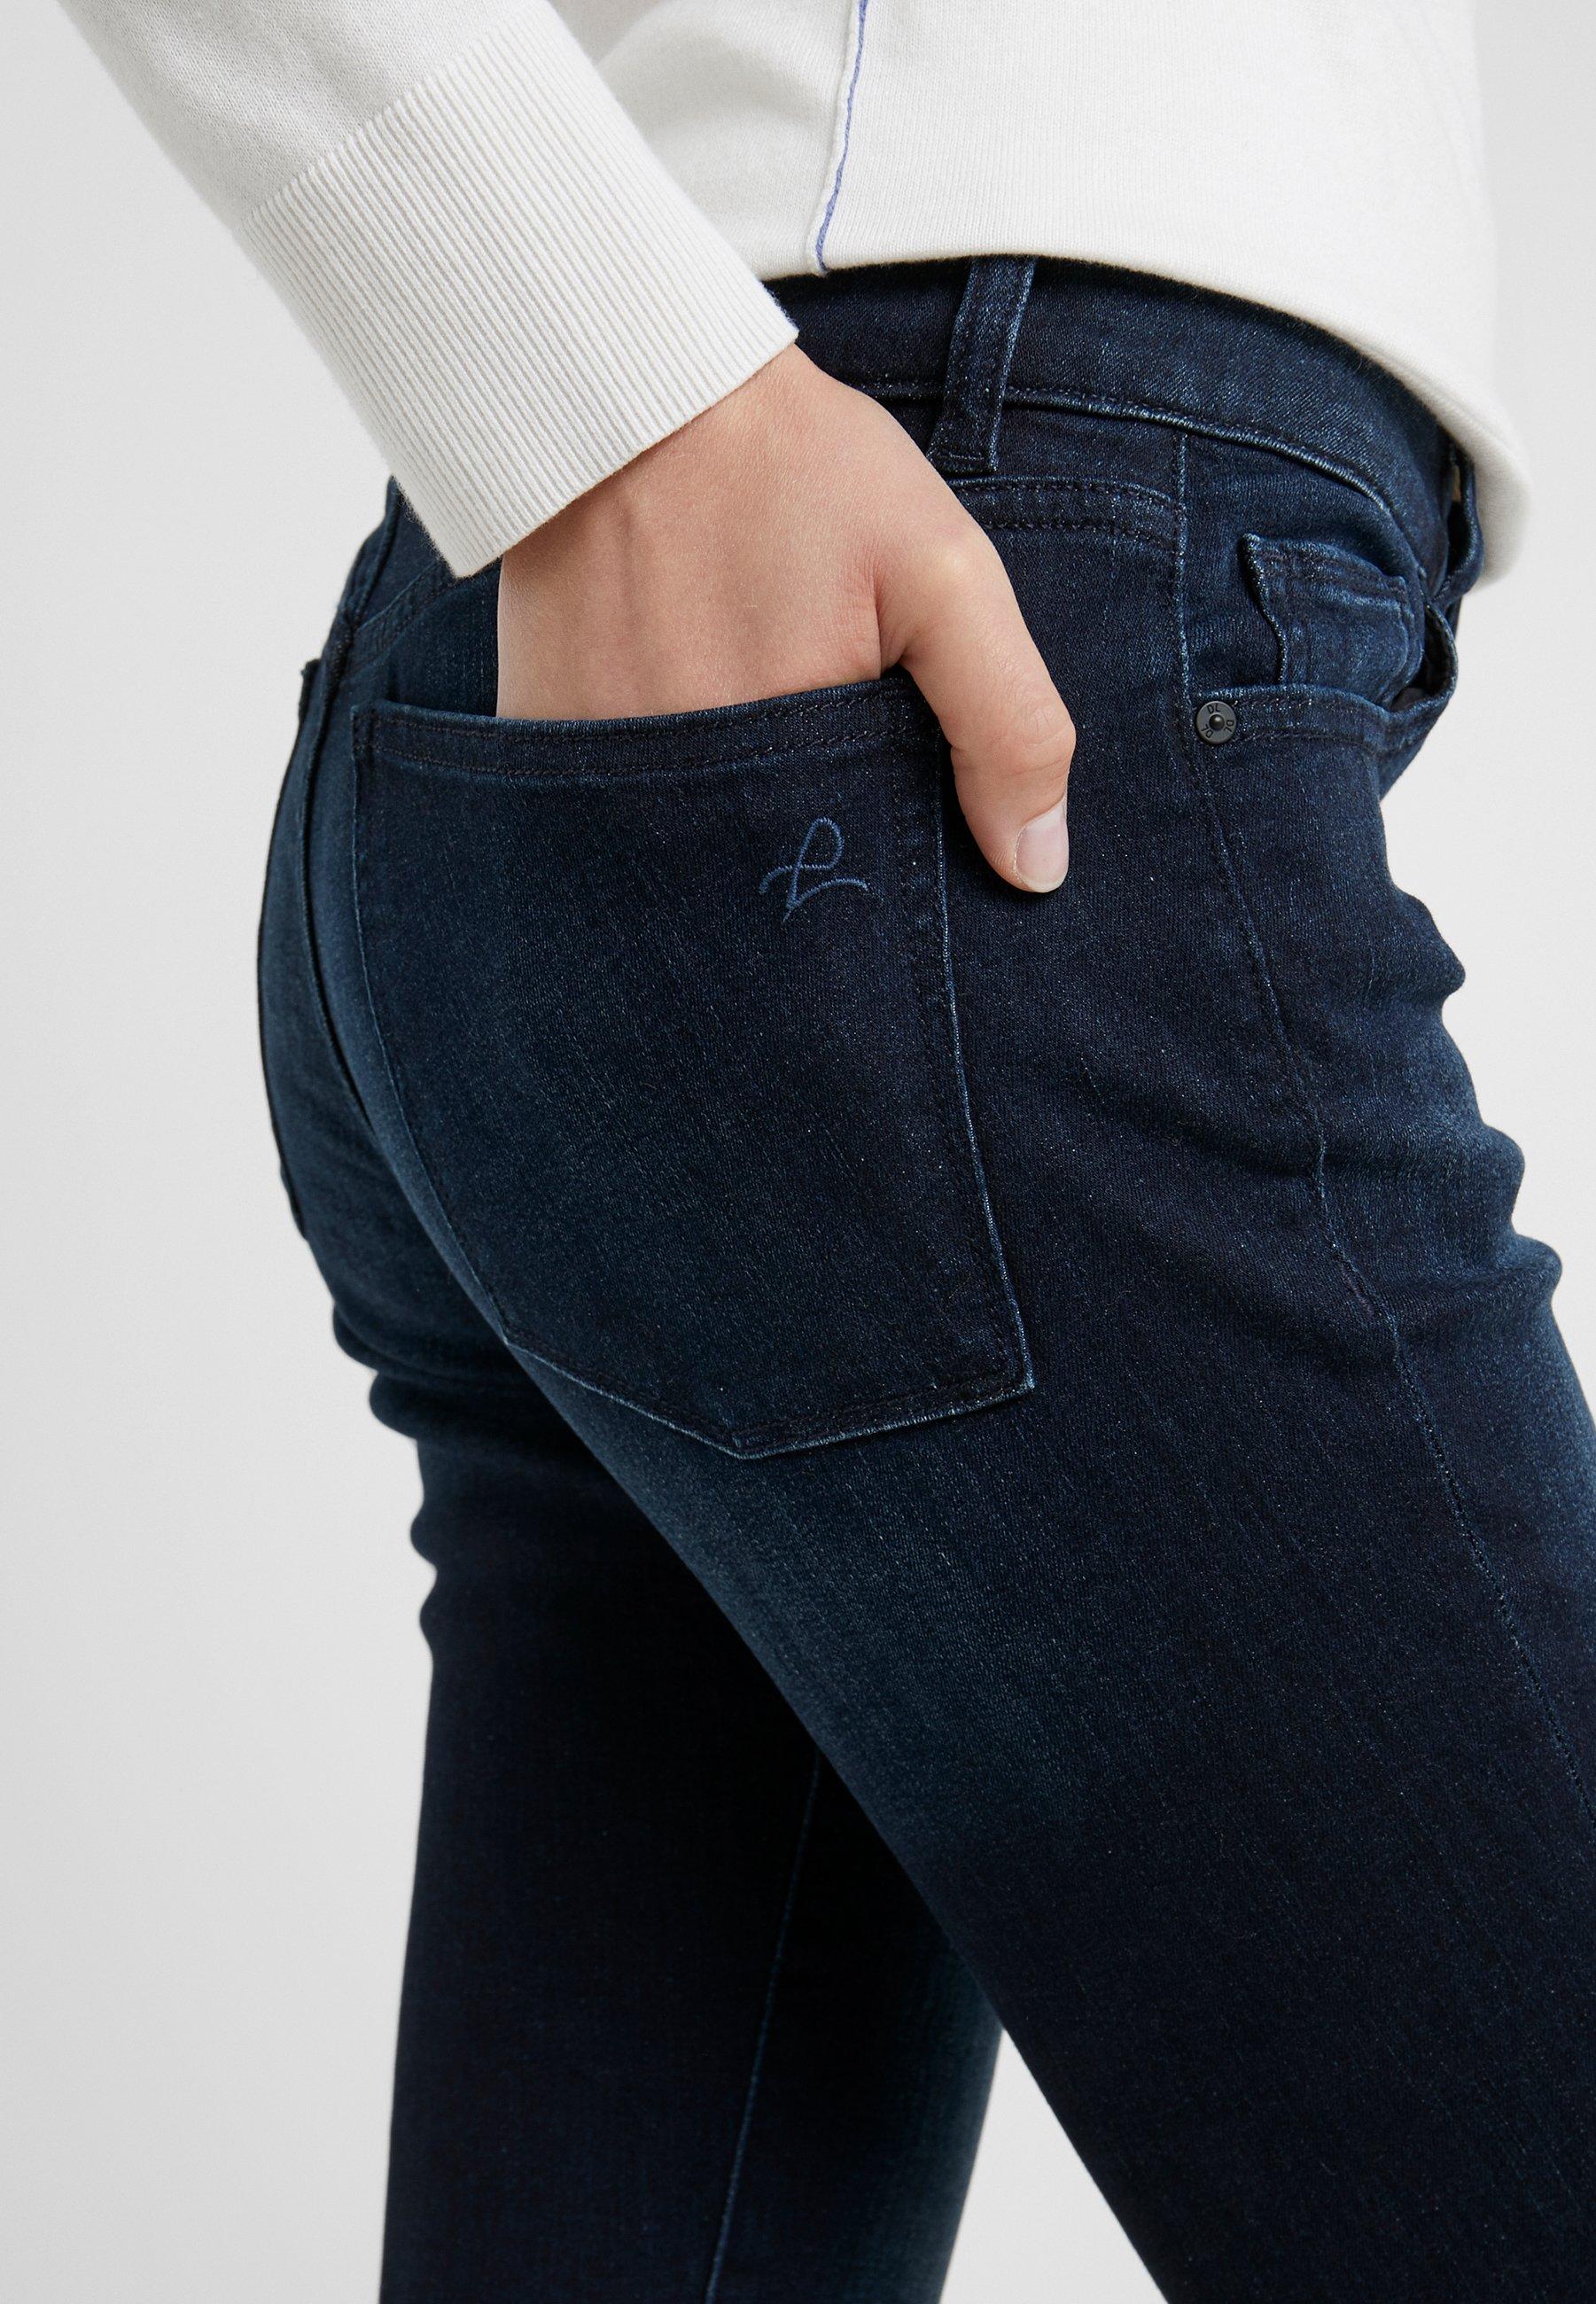 Denim Jeans Dl1961 Fit Blue Dark Slim 0k8nwOP